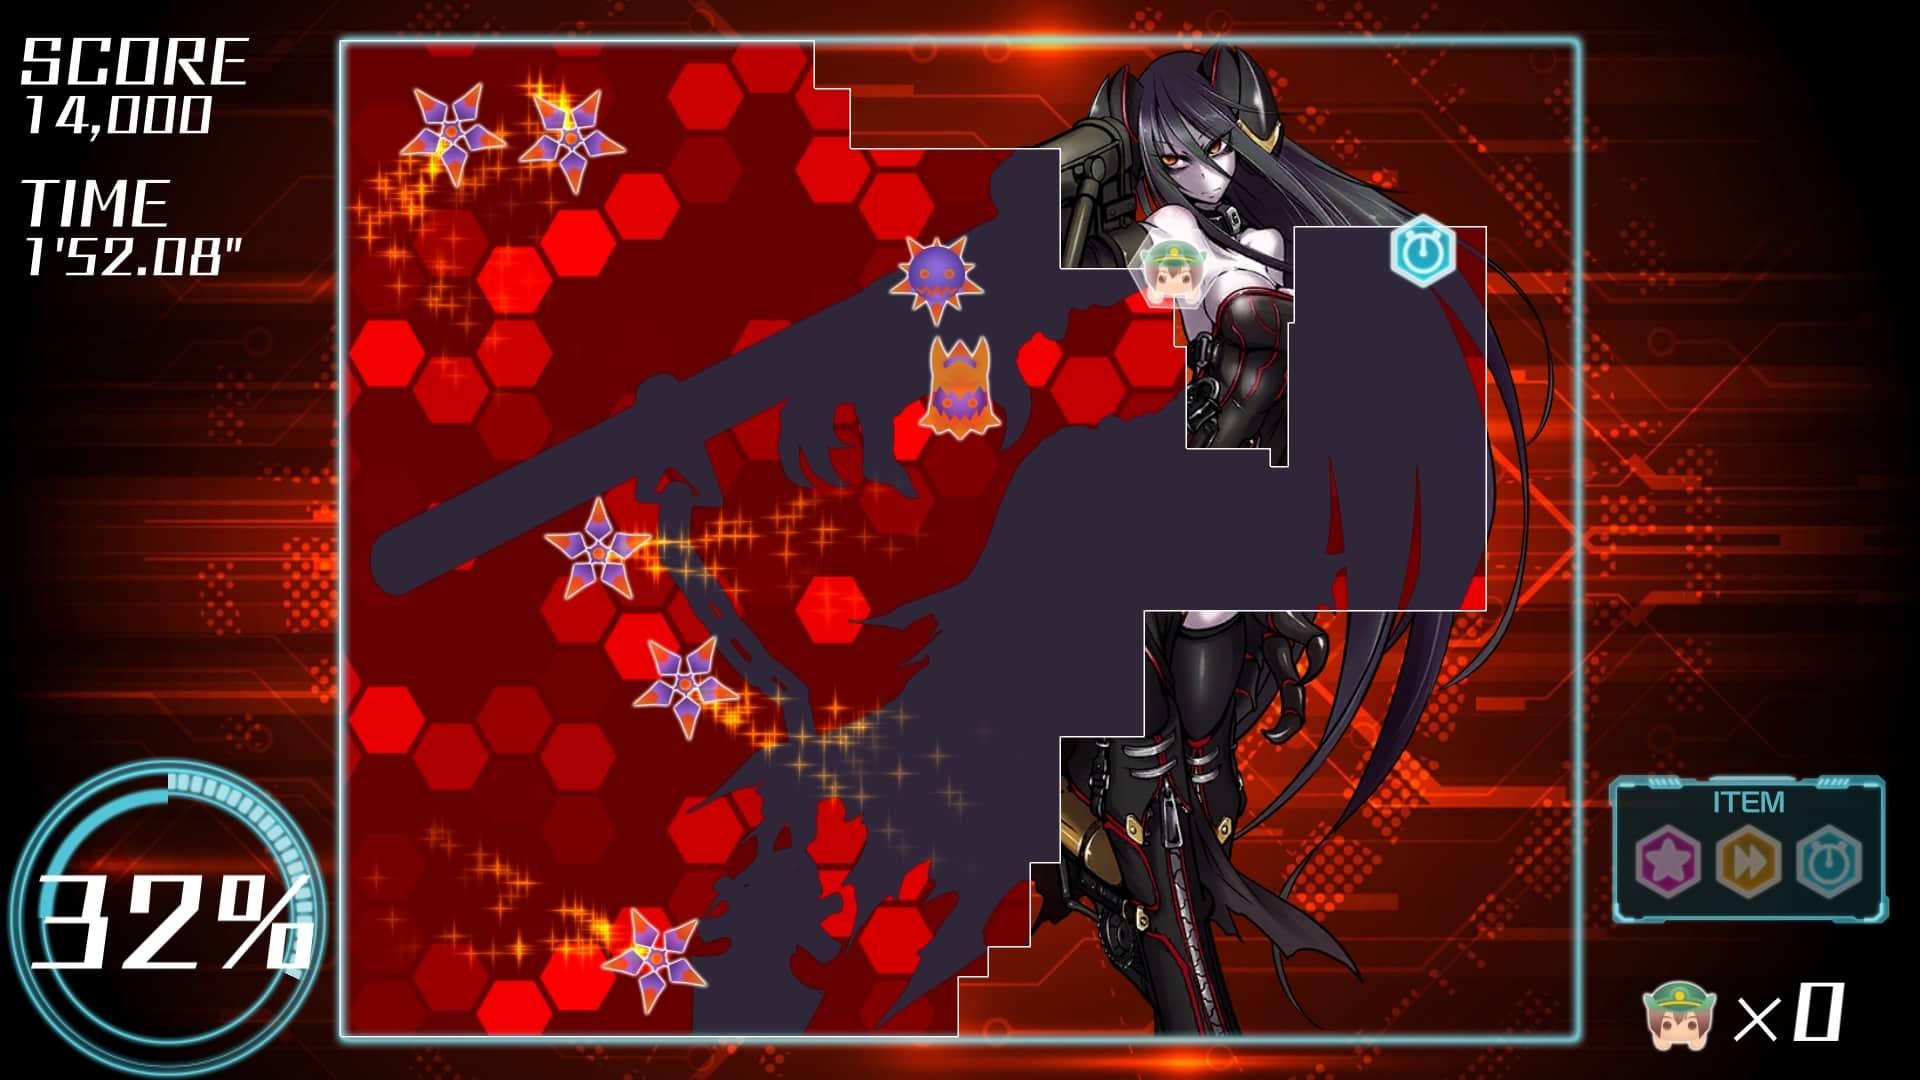 Bishoujo Battle Cyber Panic! Review - Crimson